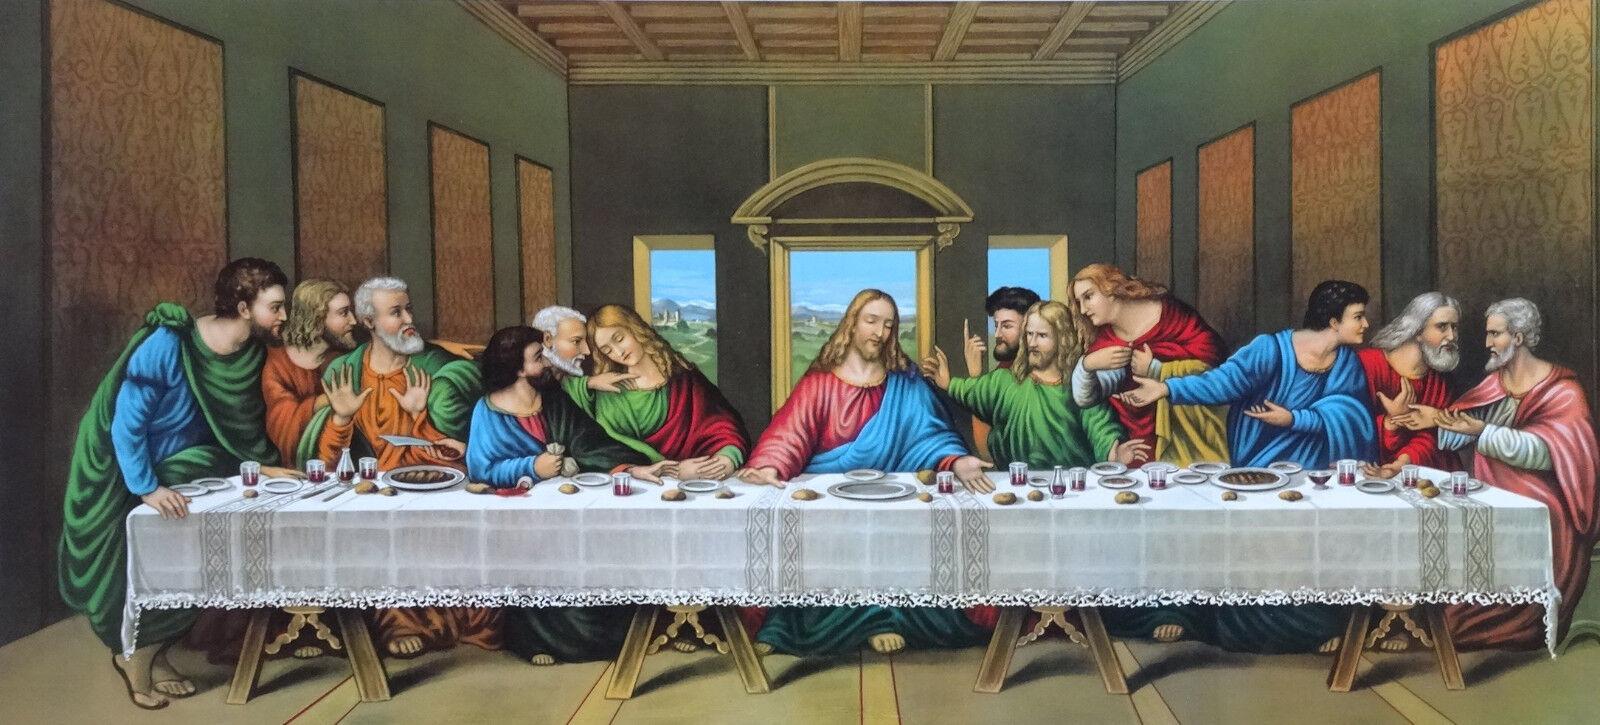 Barock Gemälde letztes Abendmahl 12 APOSTEL ULTIMA CENA Bild Repro ...